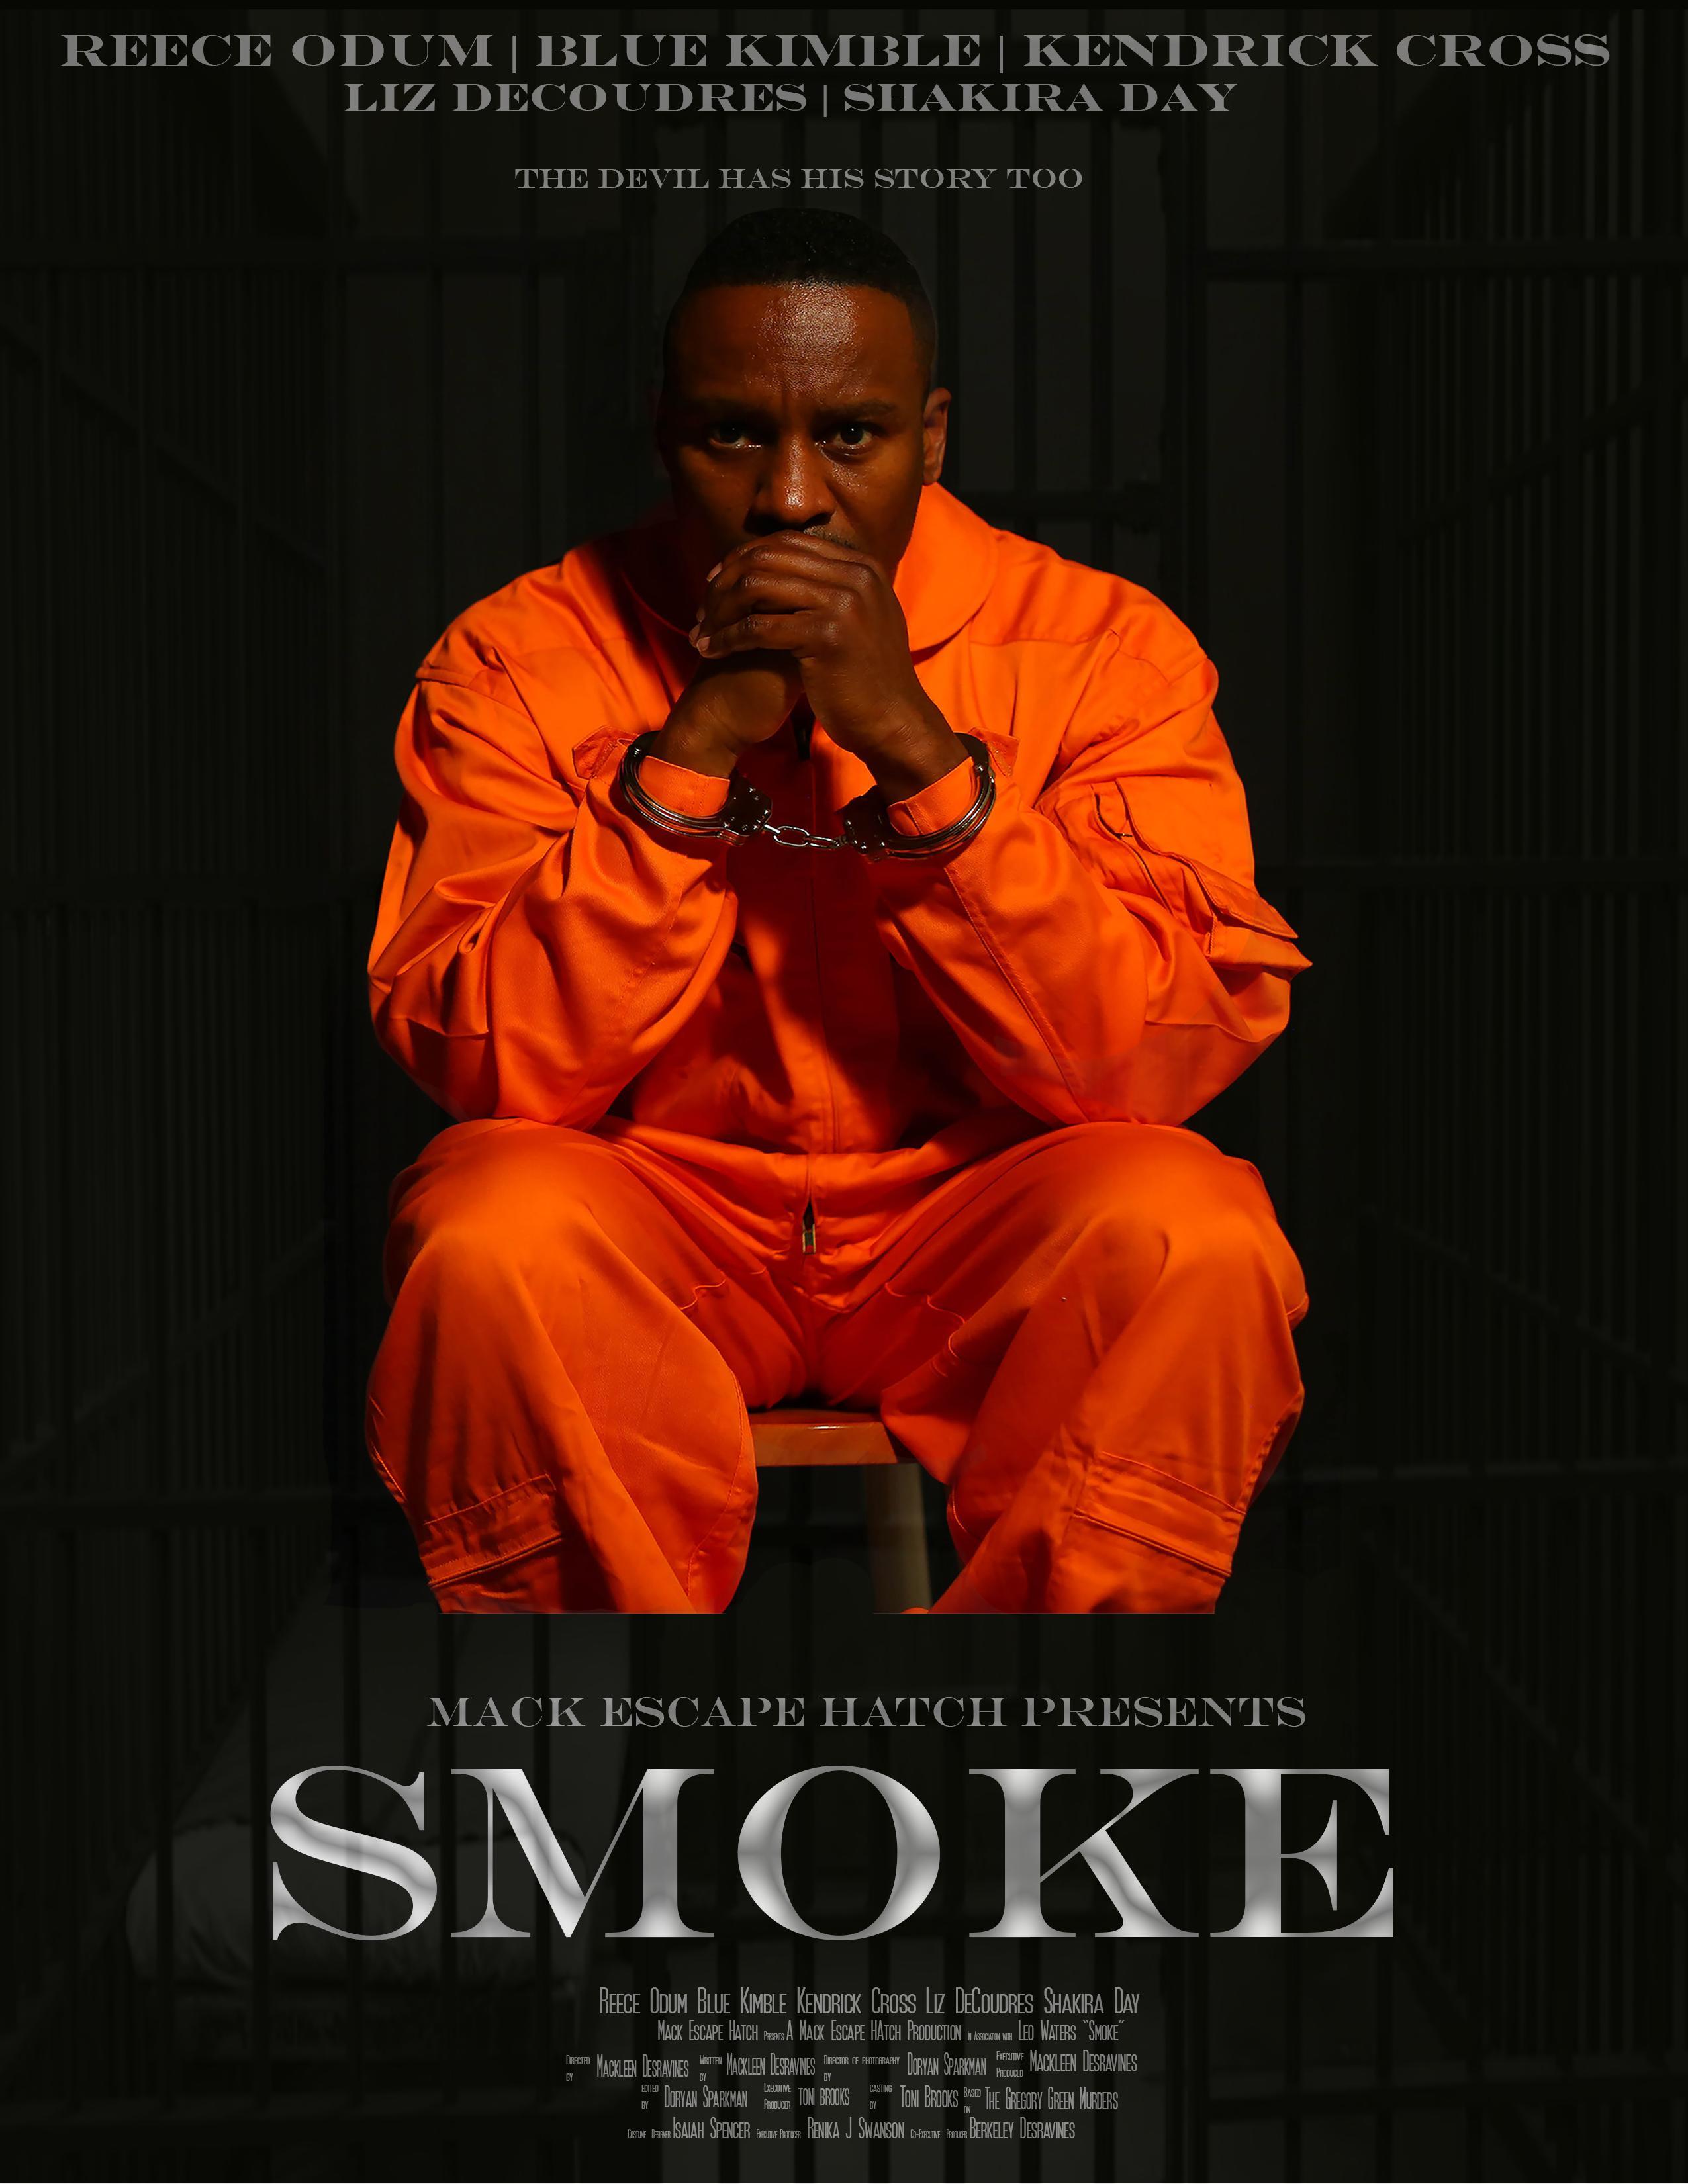 Kendrick Cross in Smoke (2018)